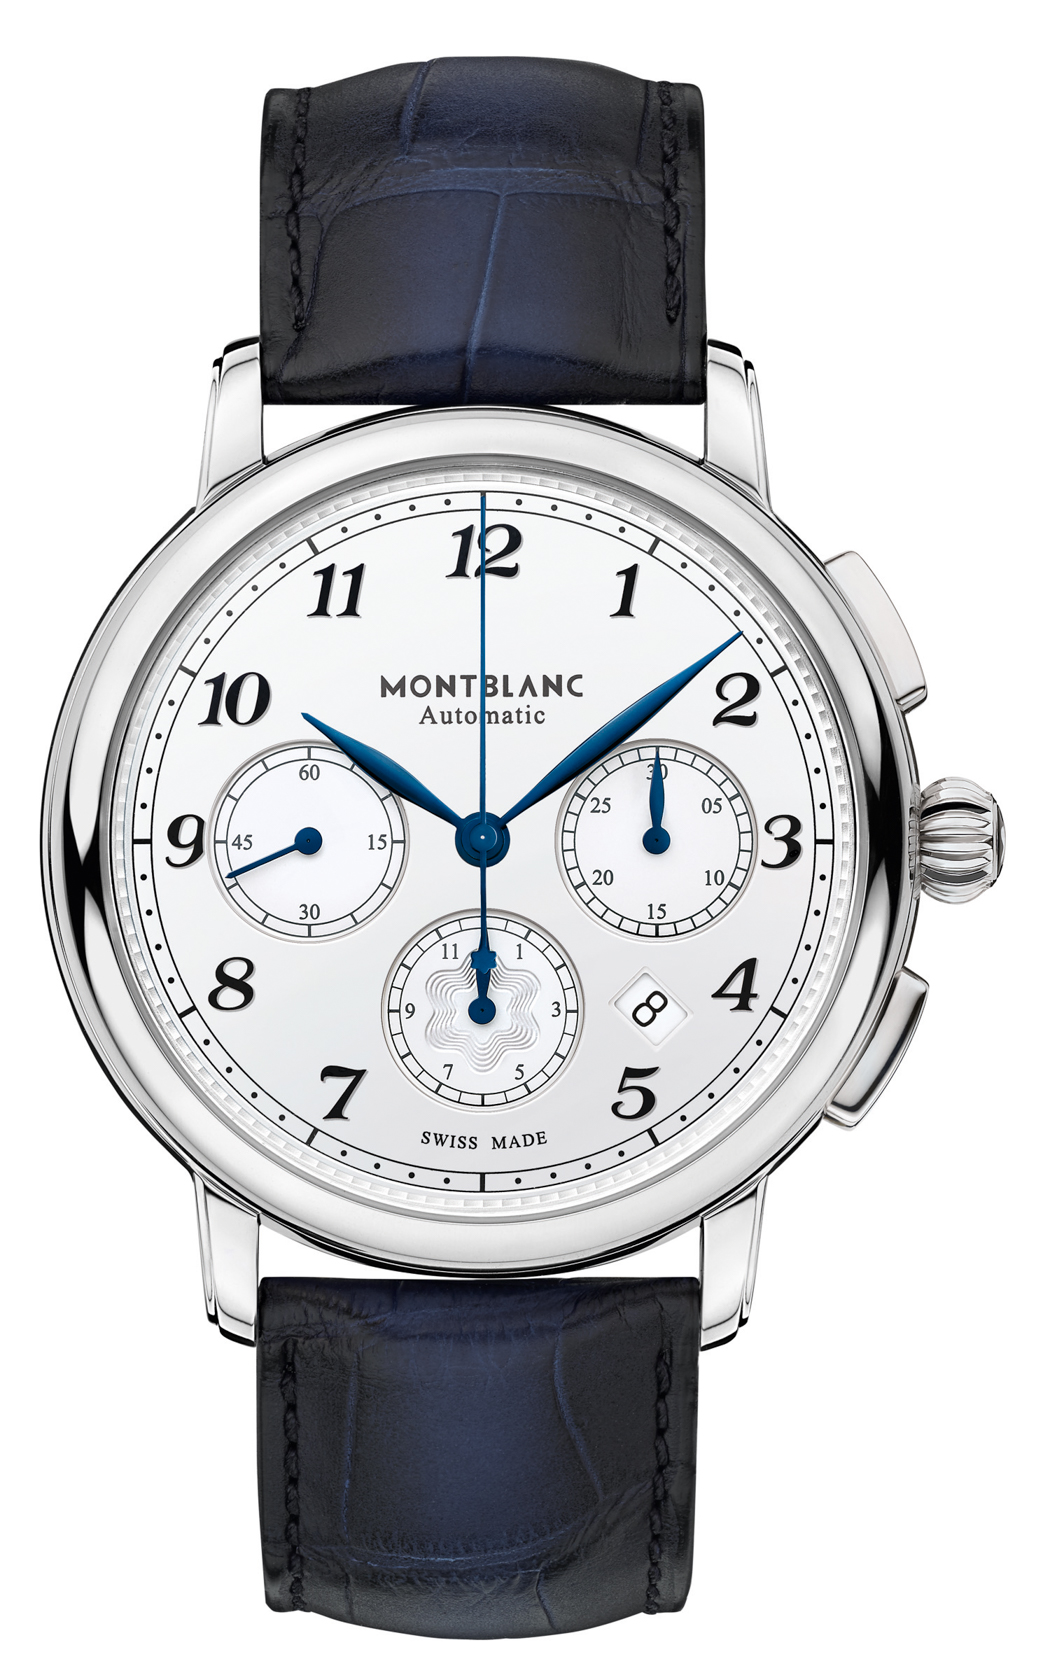 Montblanc Star Legacy Automatic Chronograph, Star Legacy Automatic Chronograph, Star Legacy Montblanc, Nicolas Rieussec, Ref. 118514, Montblanc 118514